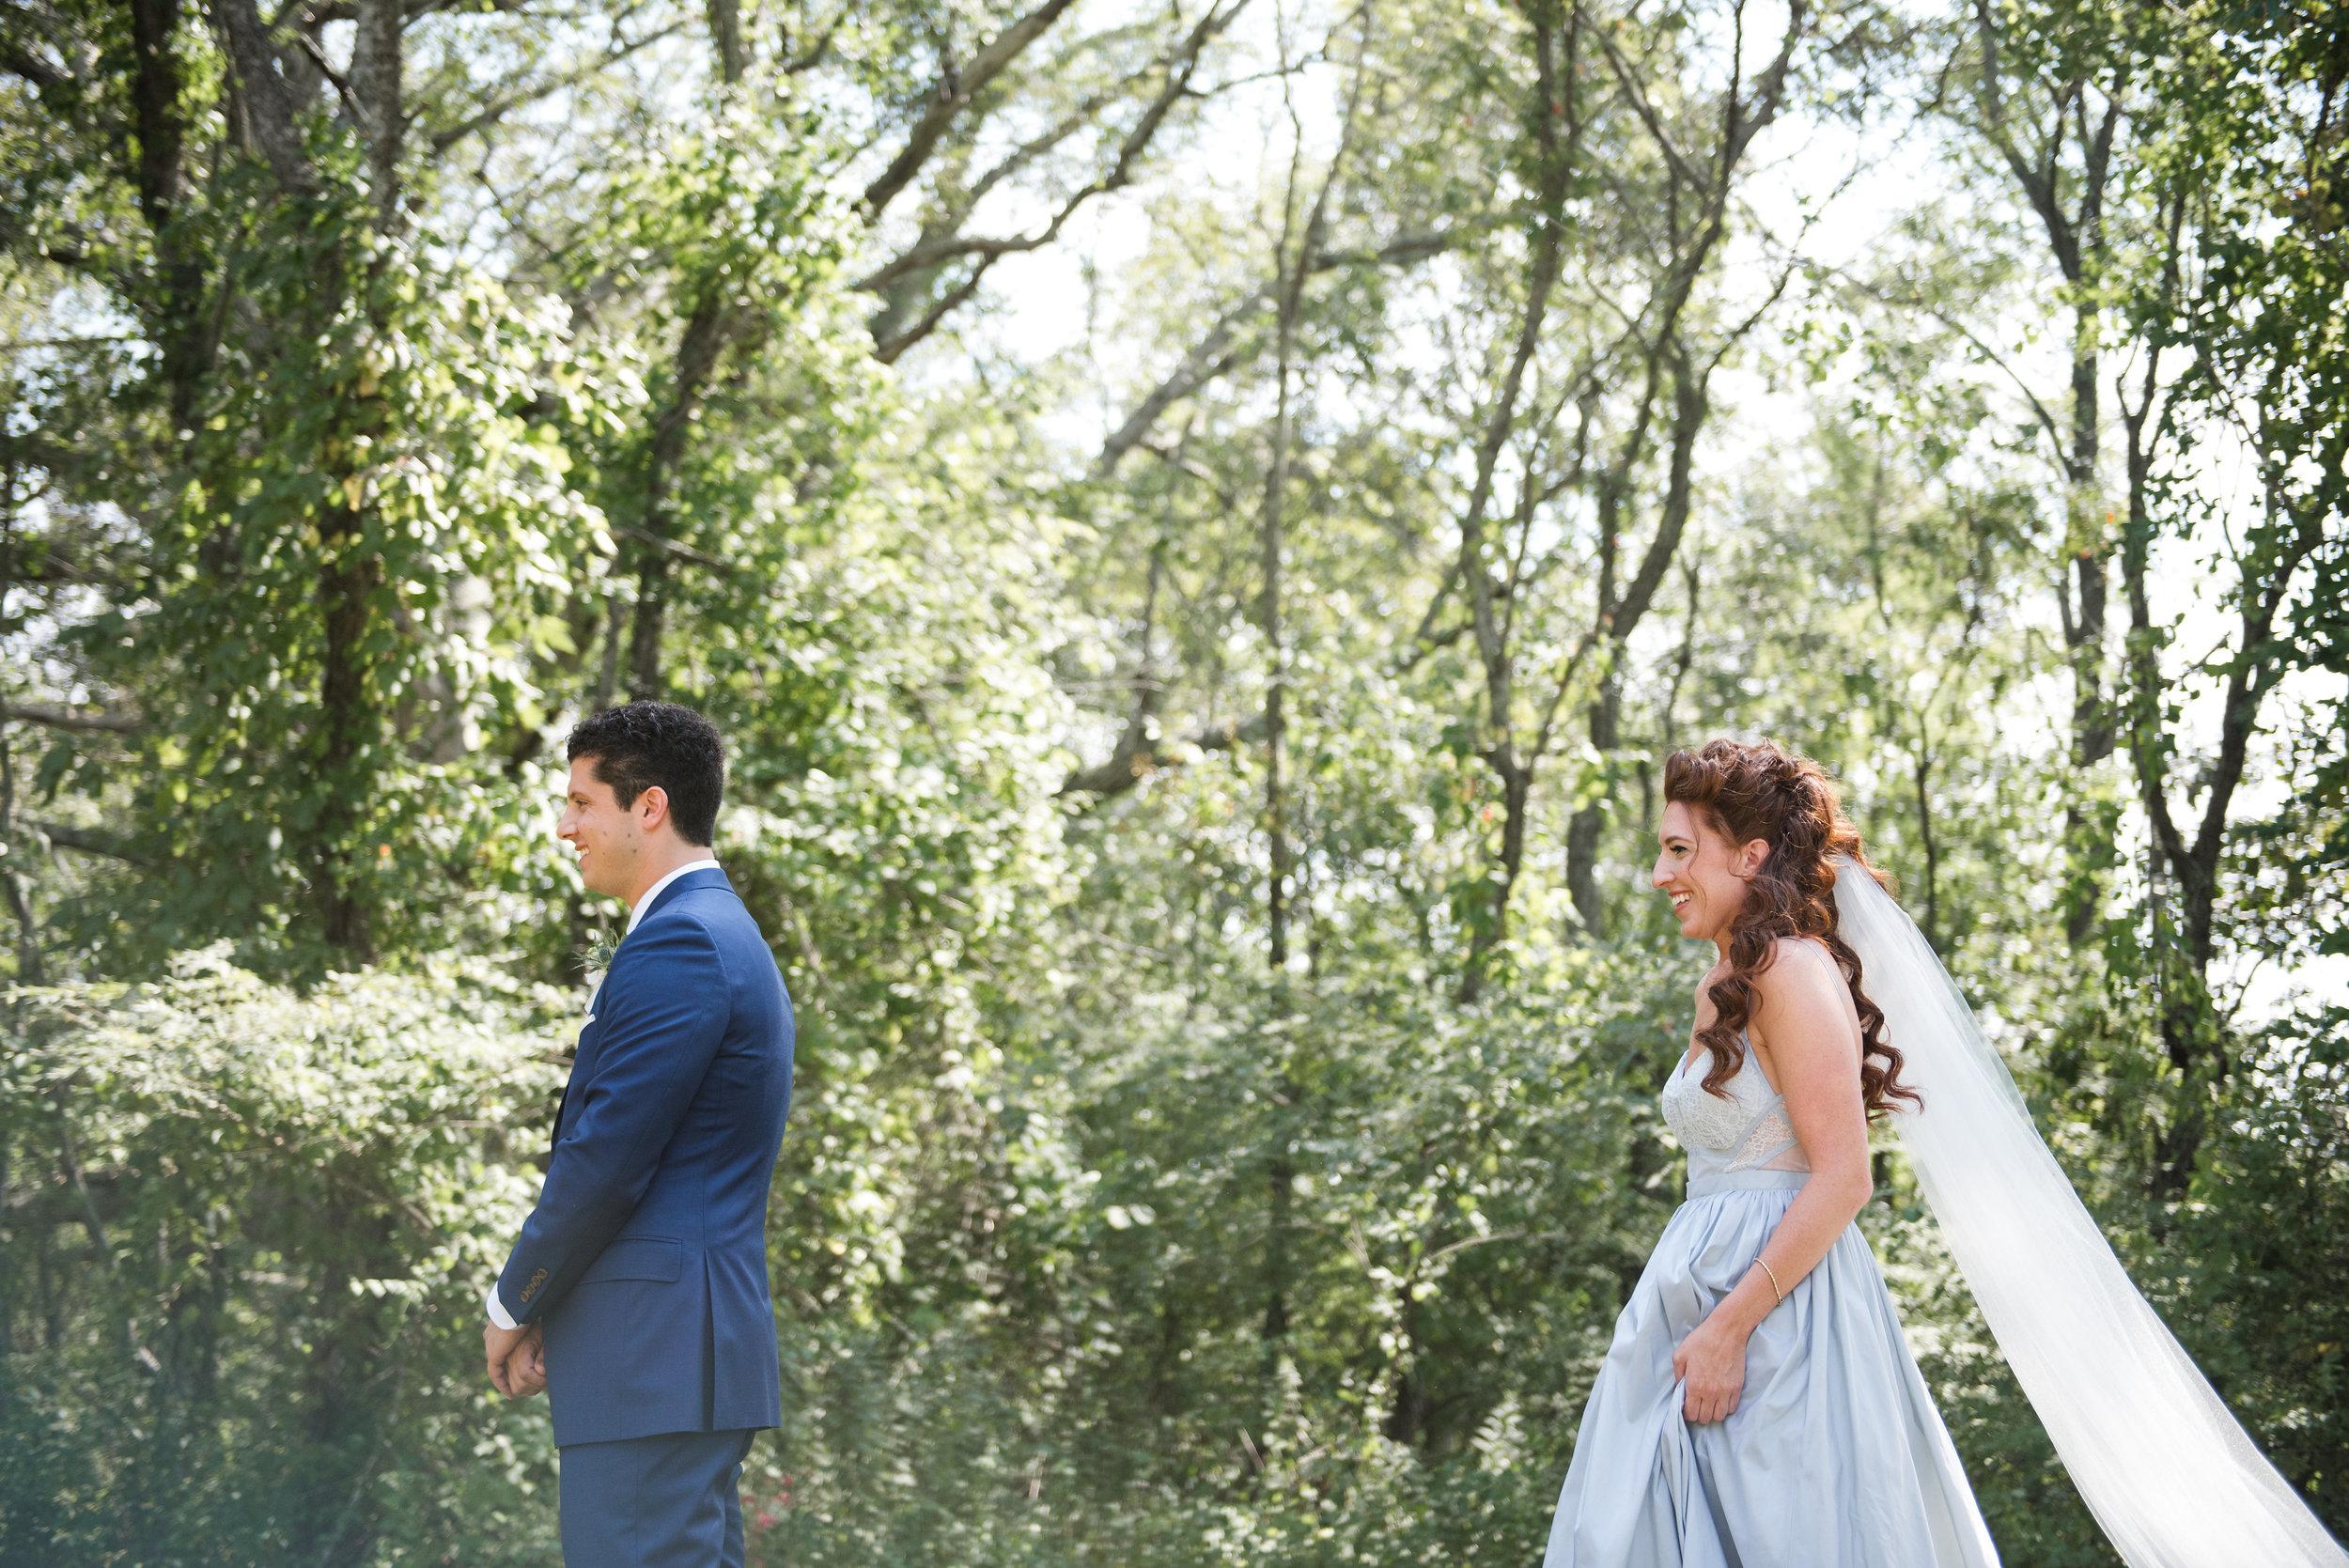 COPPER GEOMETRIC WEDDING LACE FACTORY WEDDING_003.jpg